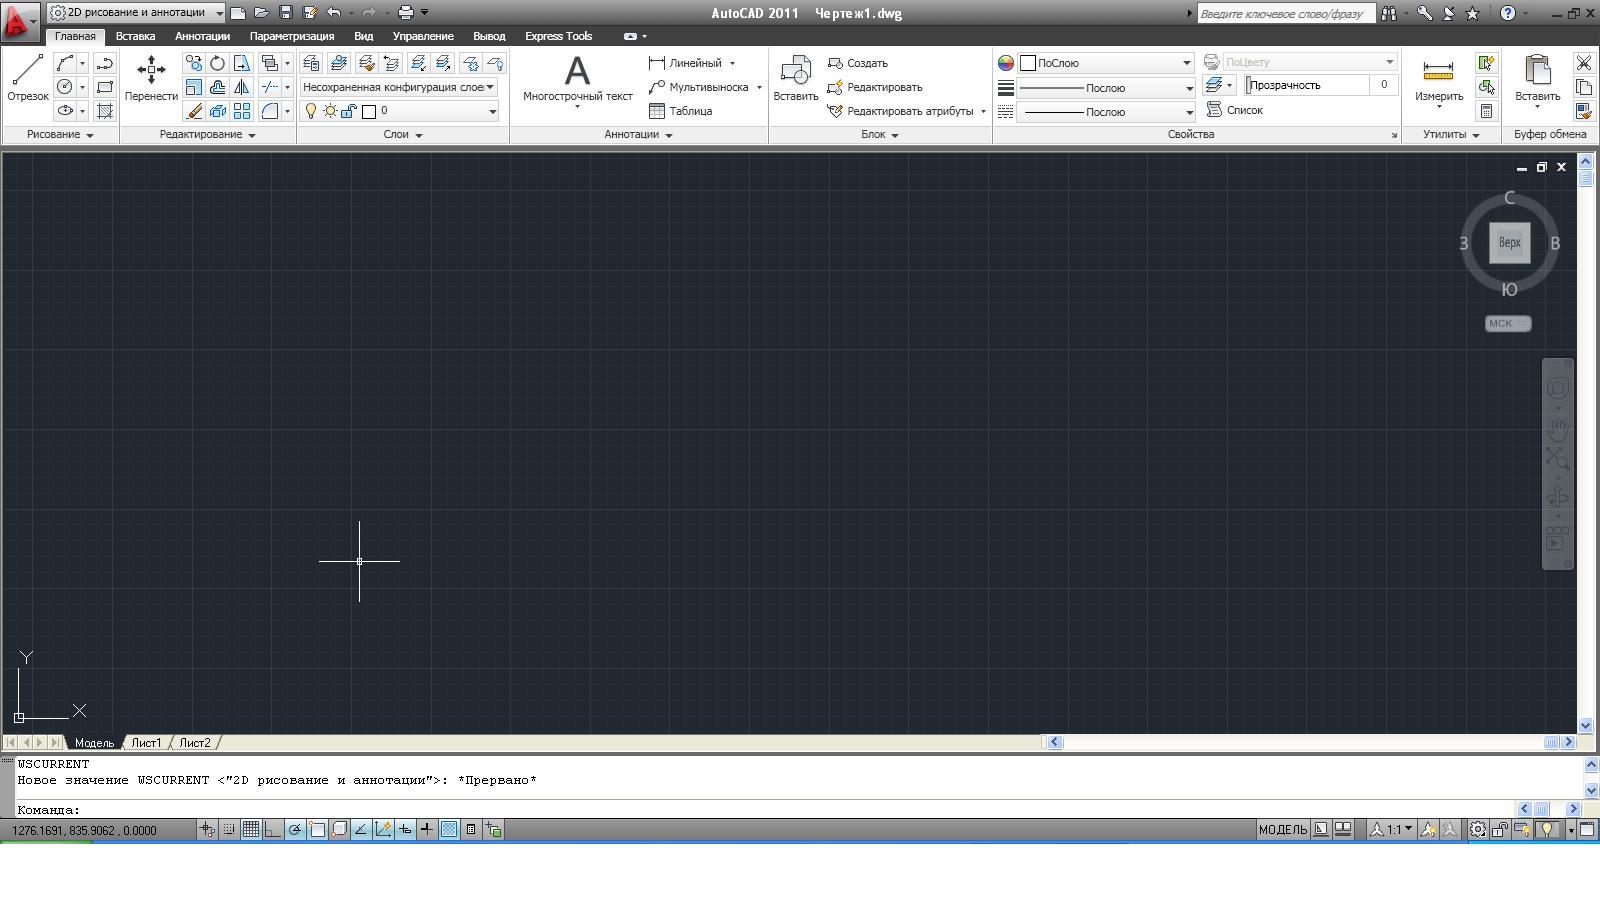 autocad 2011 torrent download 32 bit